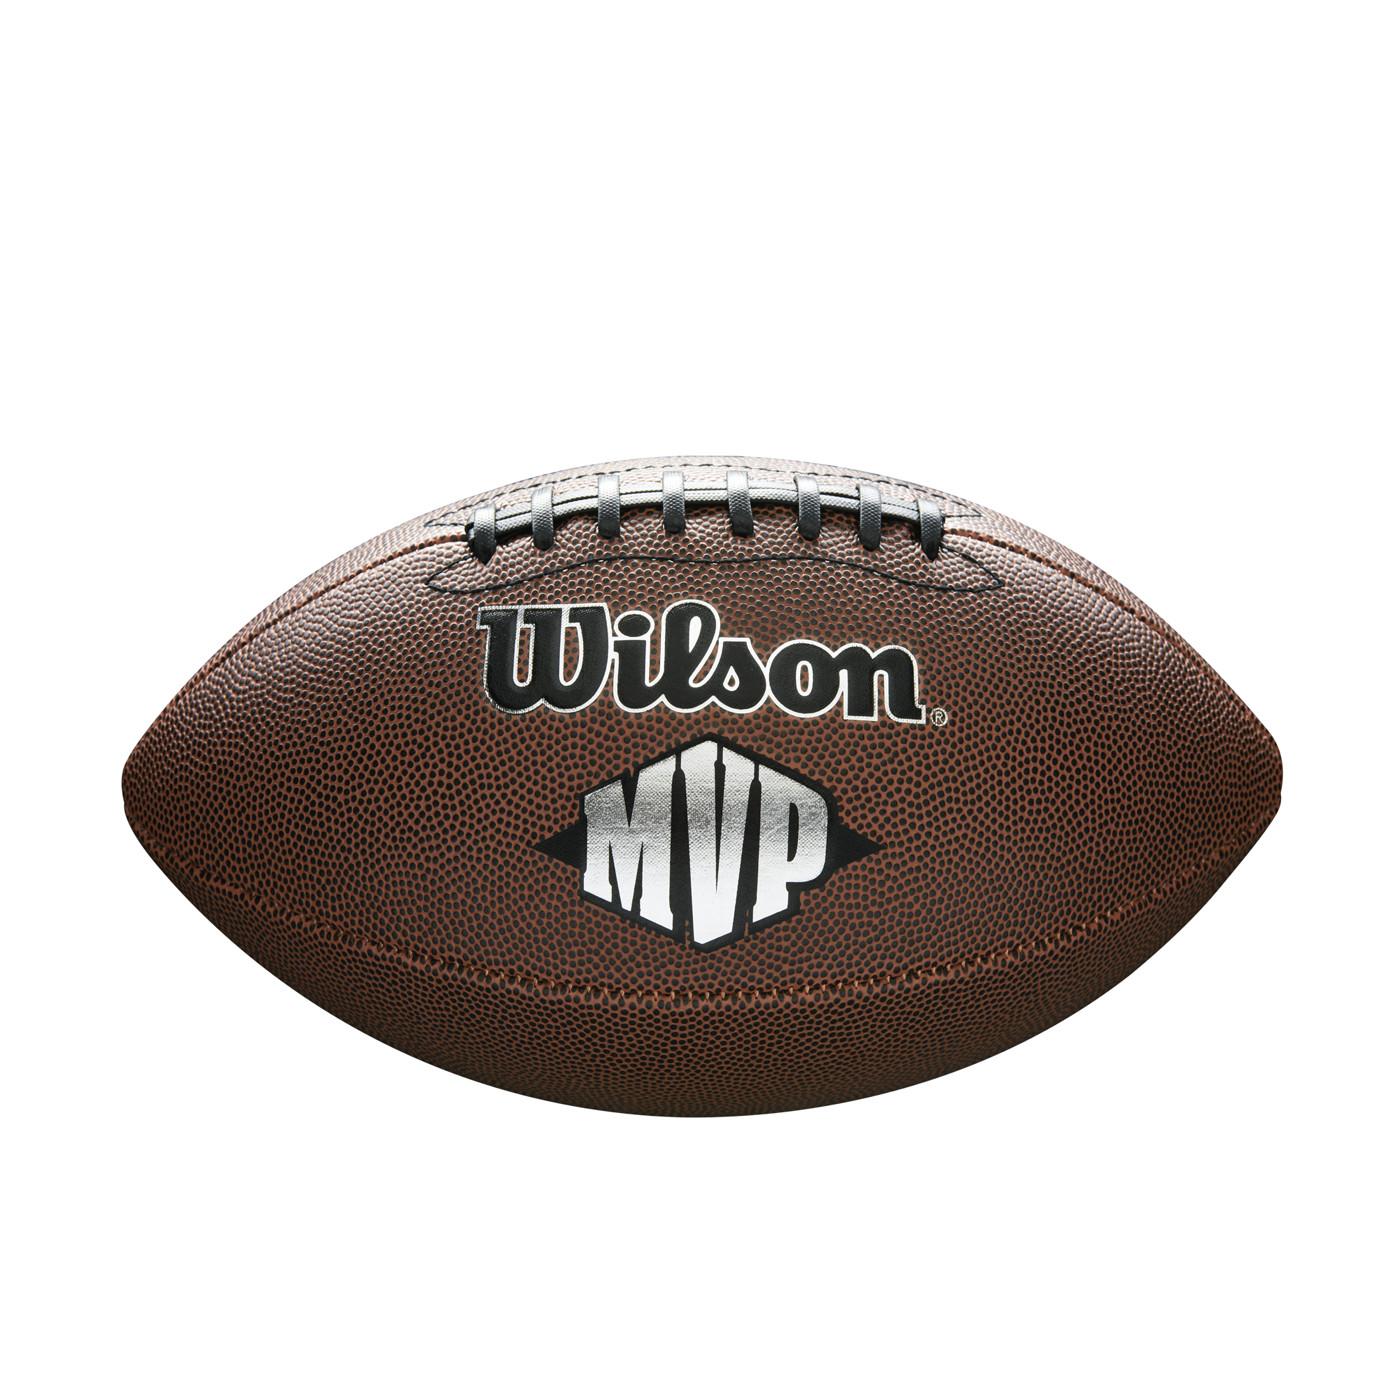 WILSON MVP OFFICIAL FOOTBALL